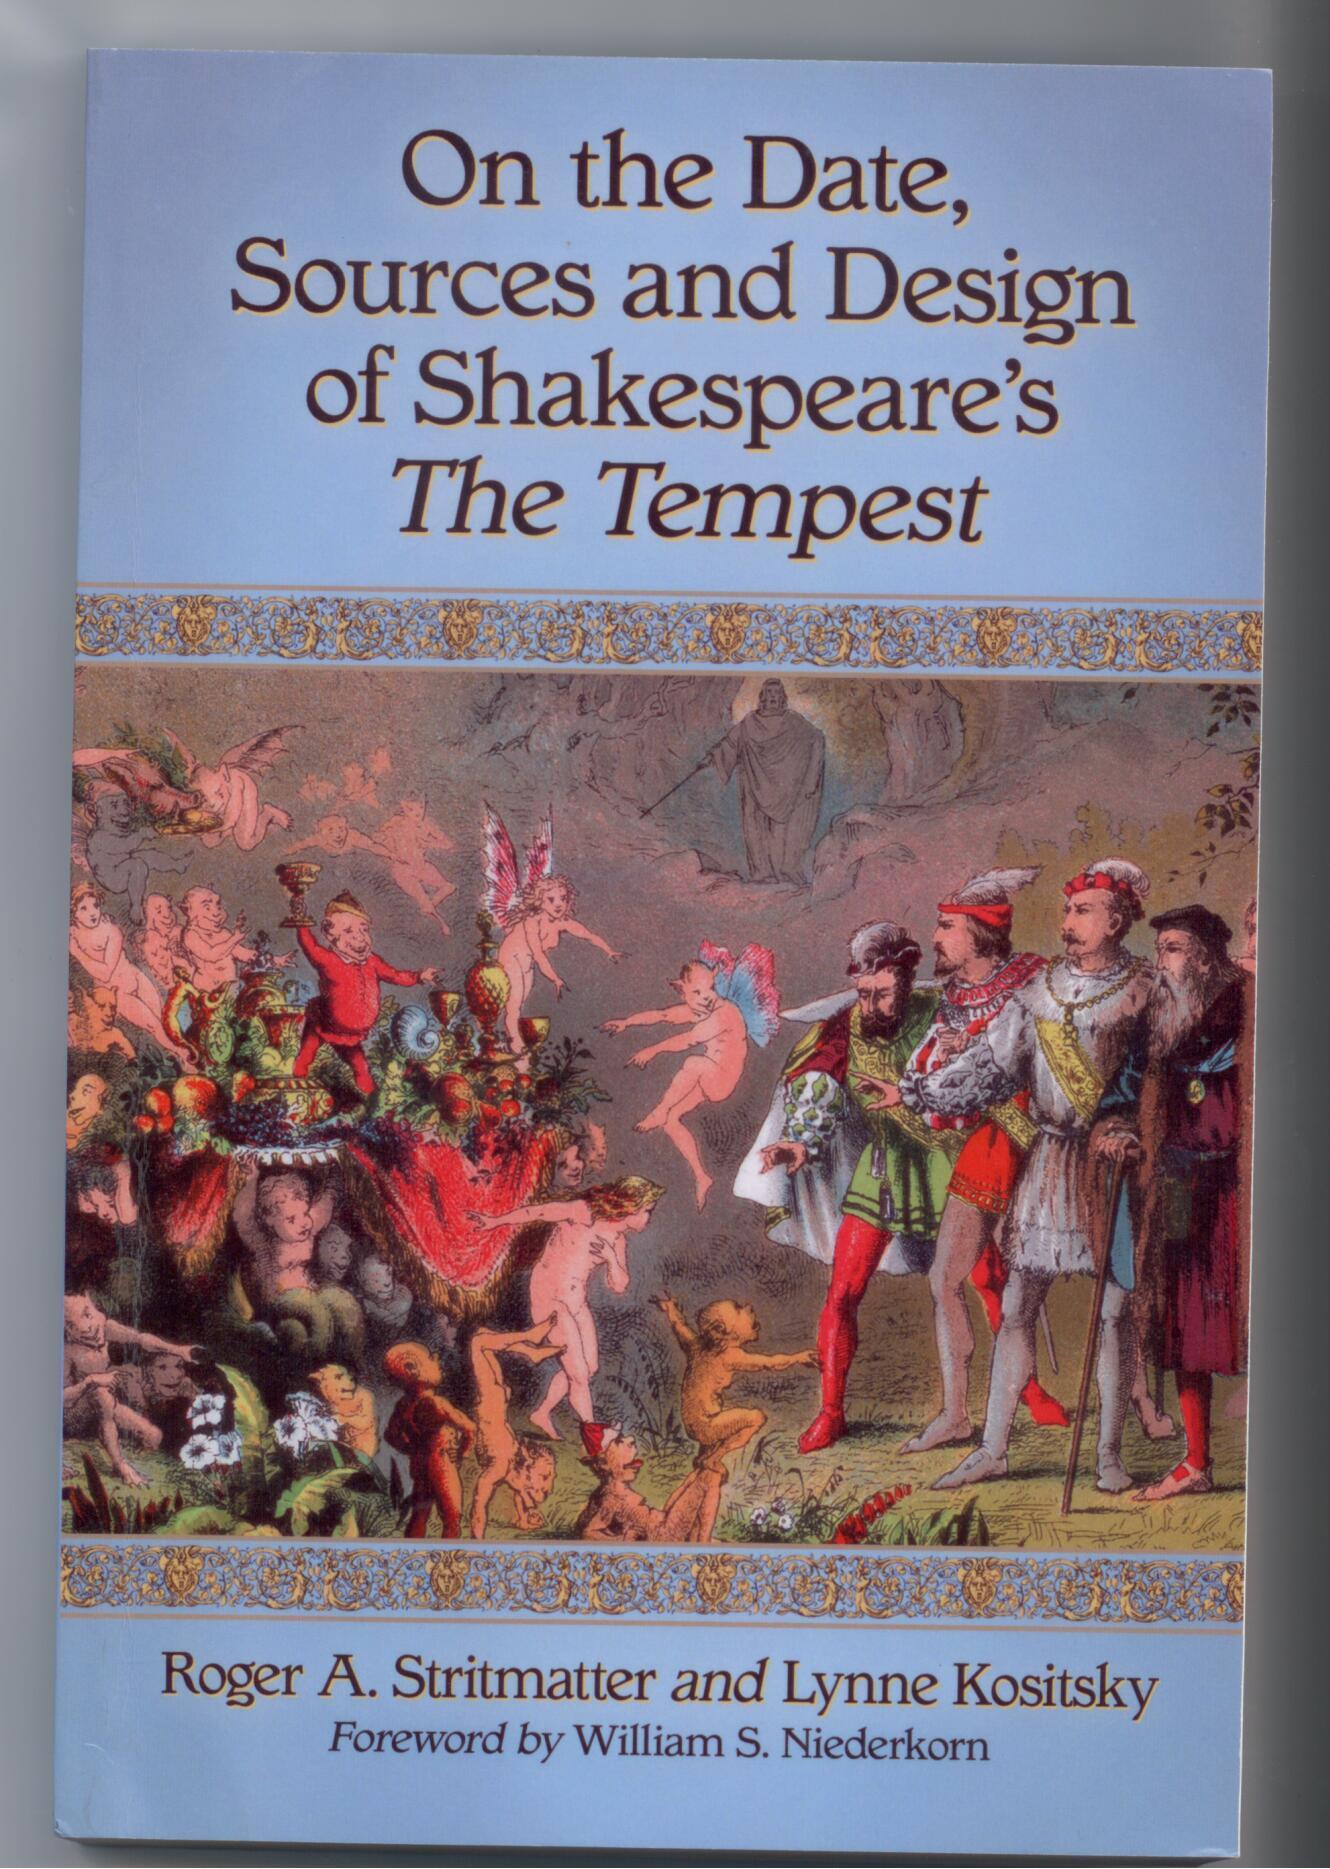 the tempest shakespeare oxford university press ebook